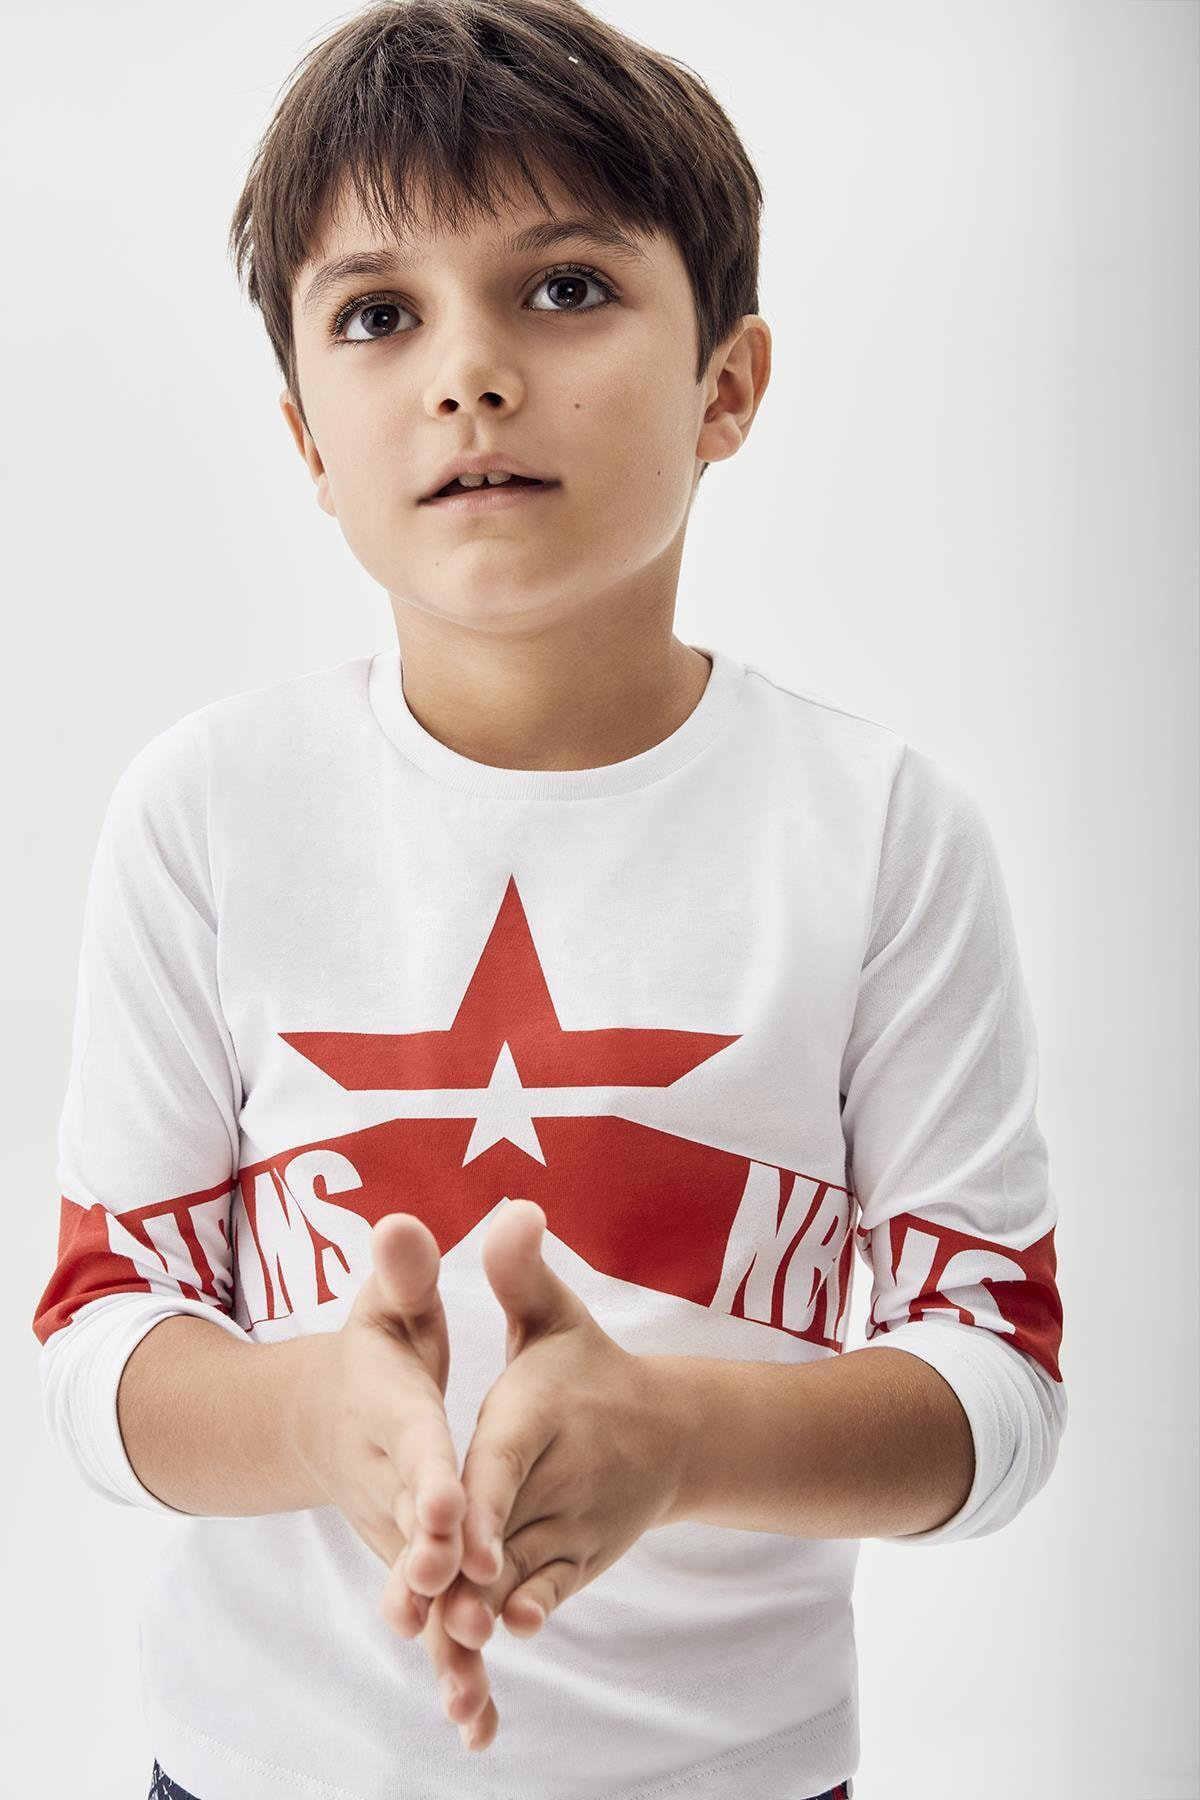 Nebbati Erkek Çocuk Beyaz T-shirt 20pfwnb3501 1